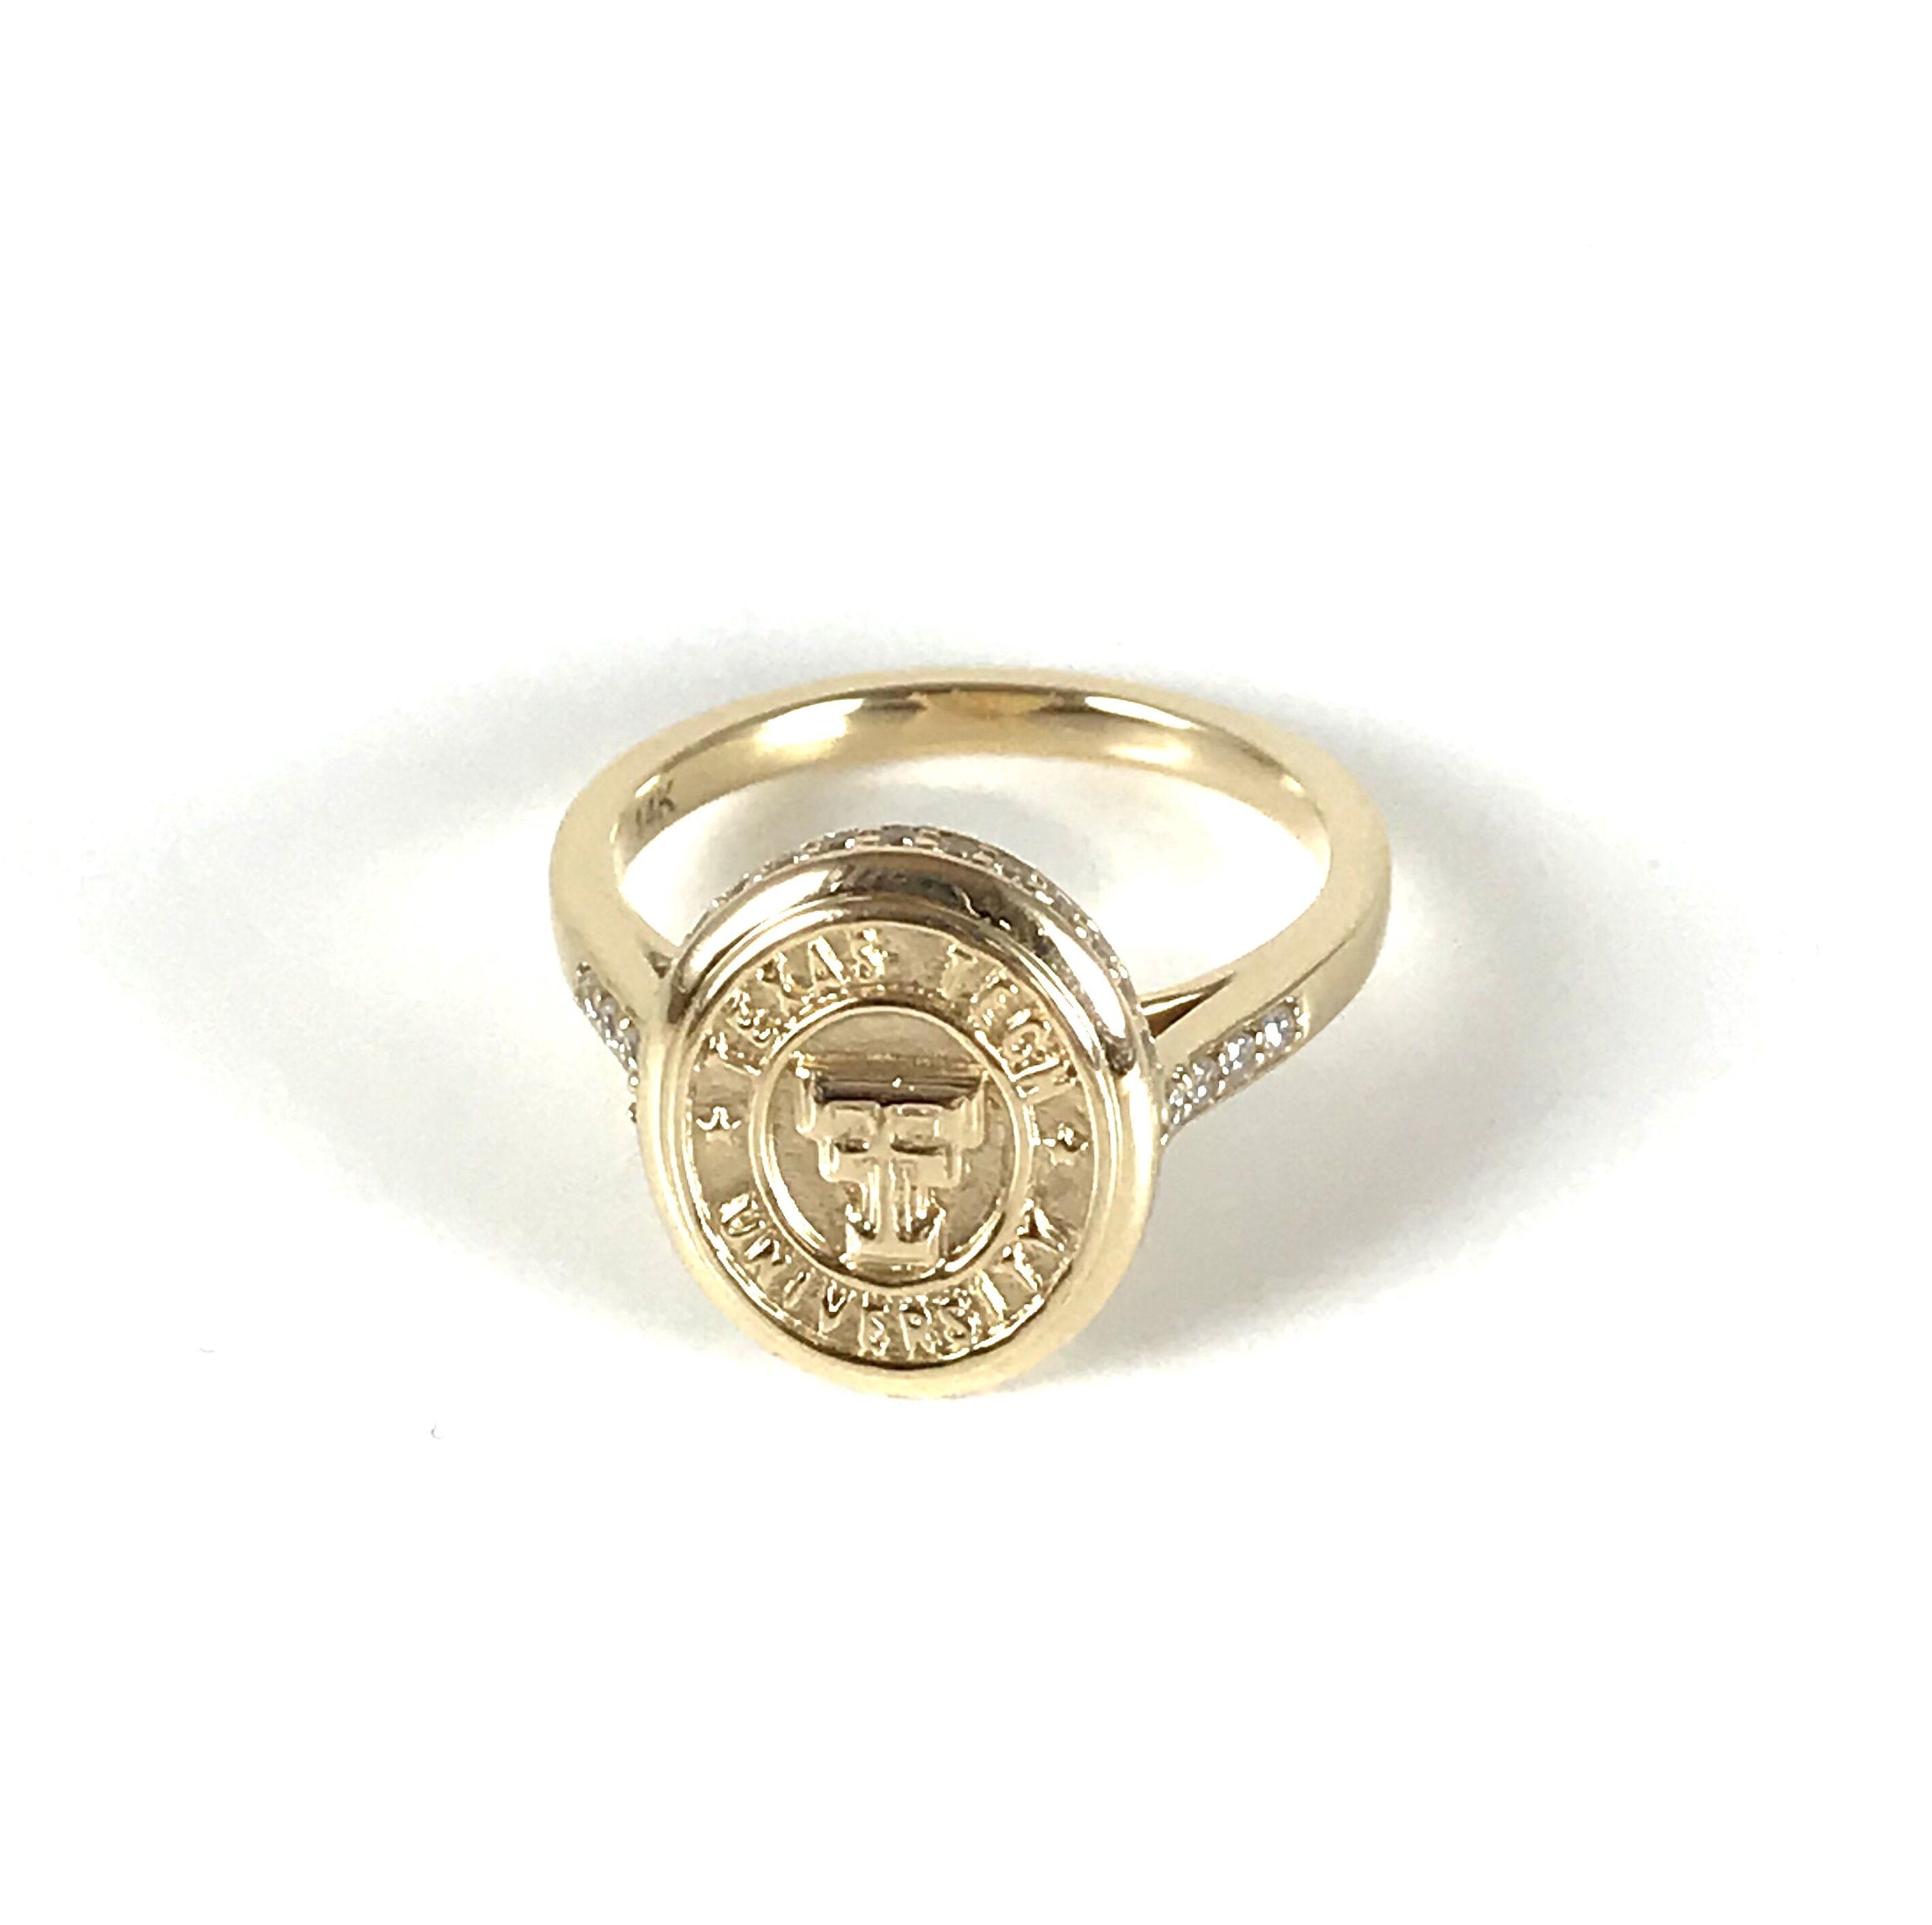 Texas Tech Classic Elegance Ladies Ring